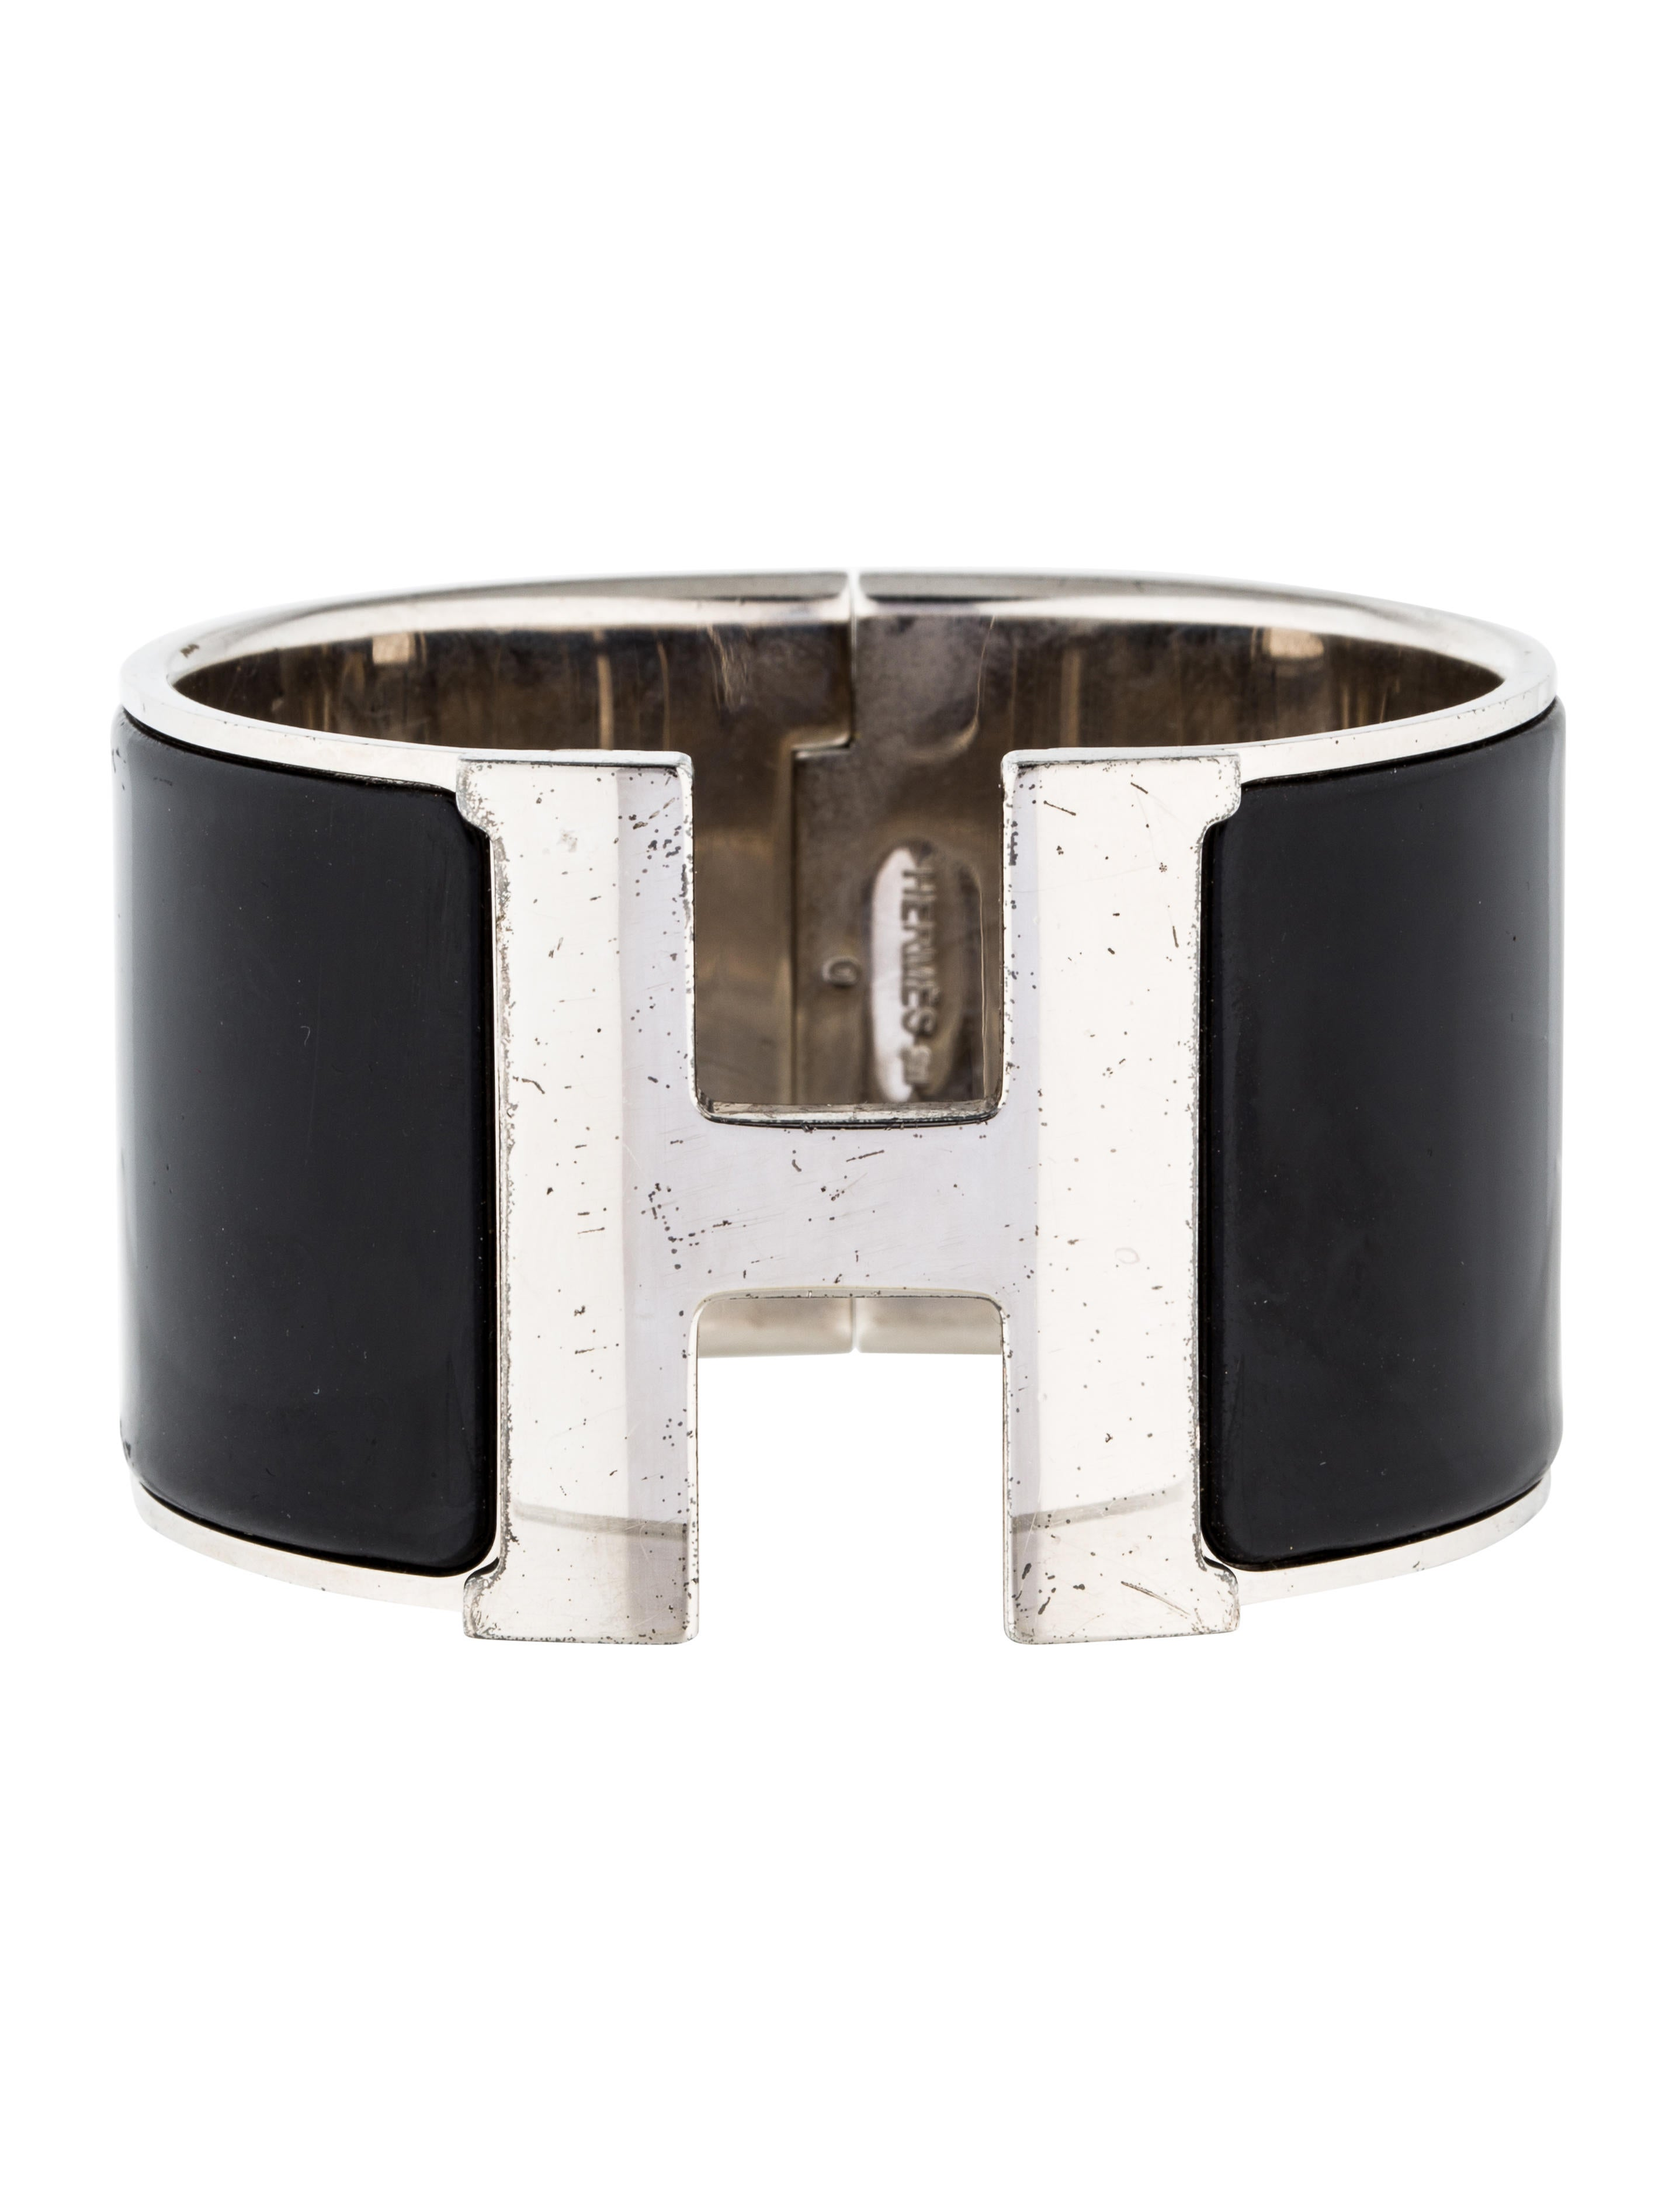 herm s extra wide clic clac h bracelet bracelets. Black Bedroom Furniture Sets. Home Design Ideas